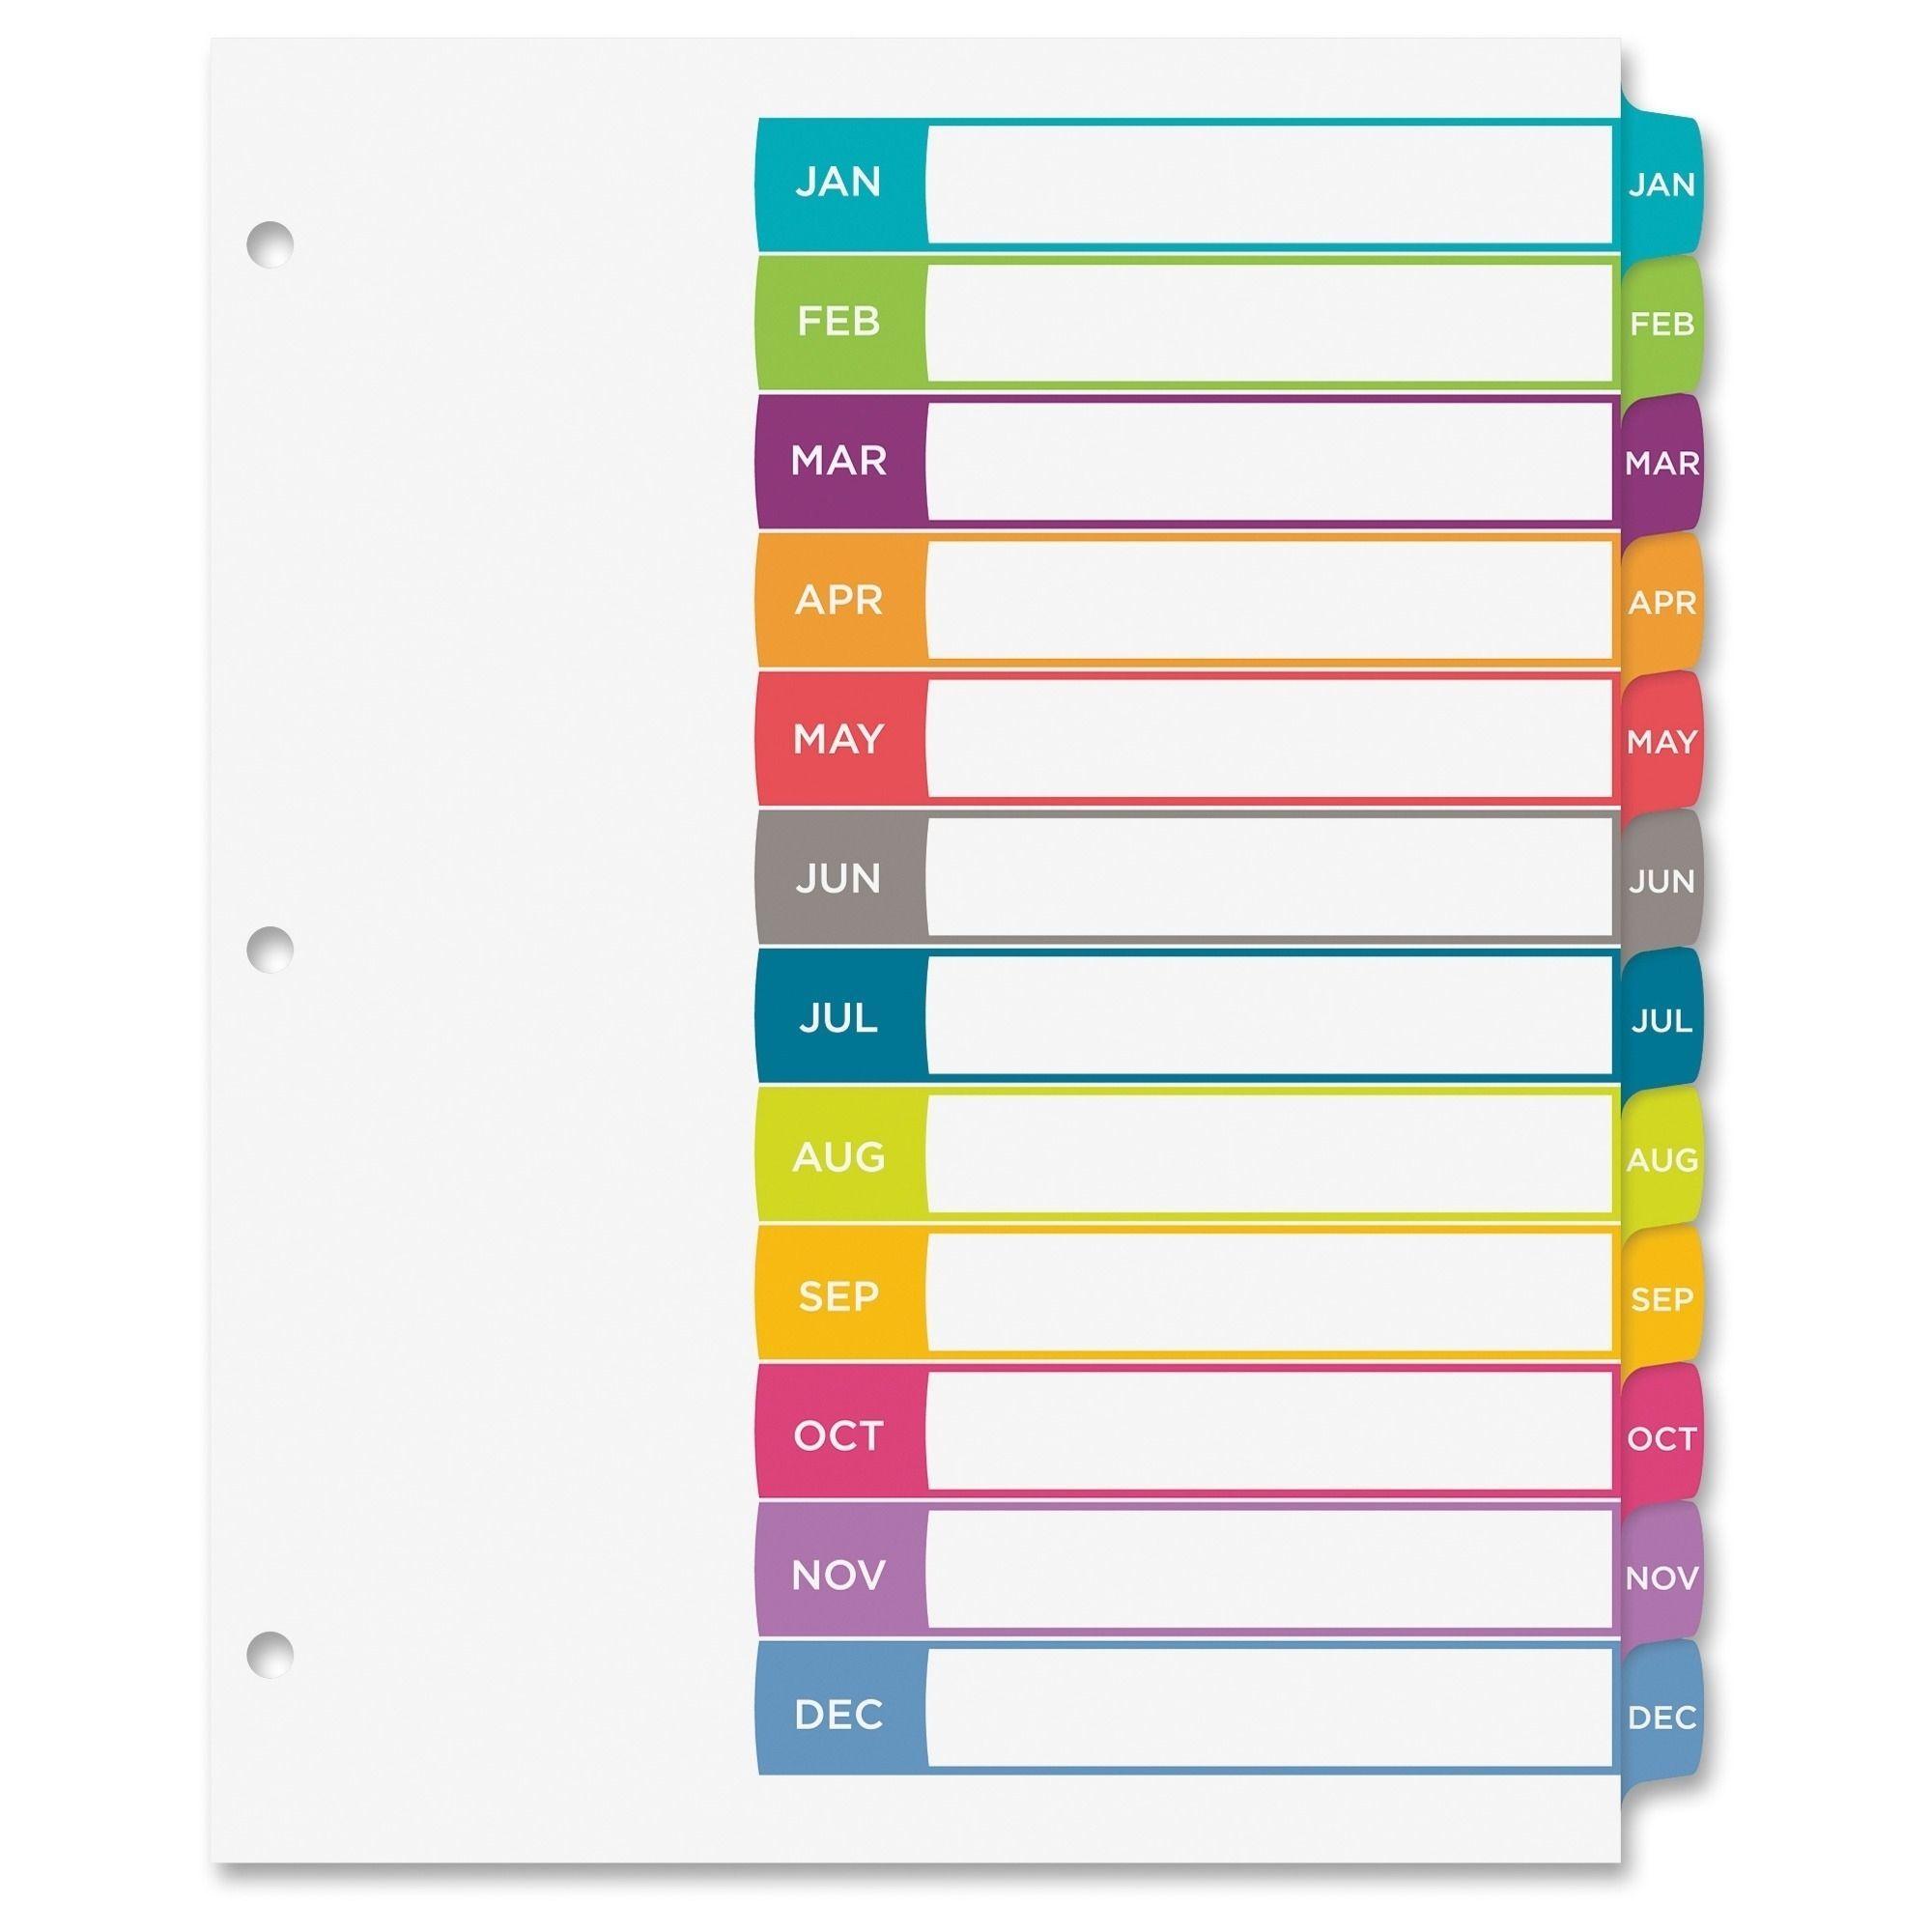 Avery Ready Index Jan Dec Tab Dividers Templates Pinterest